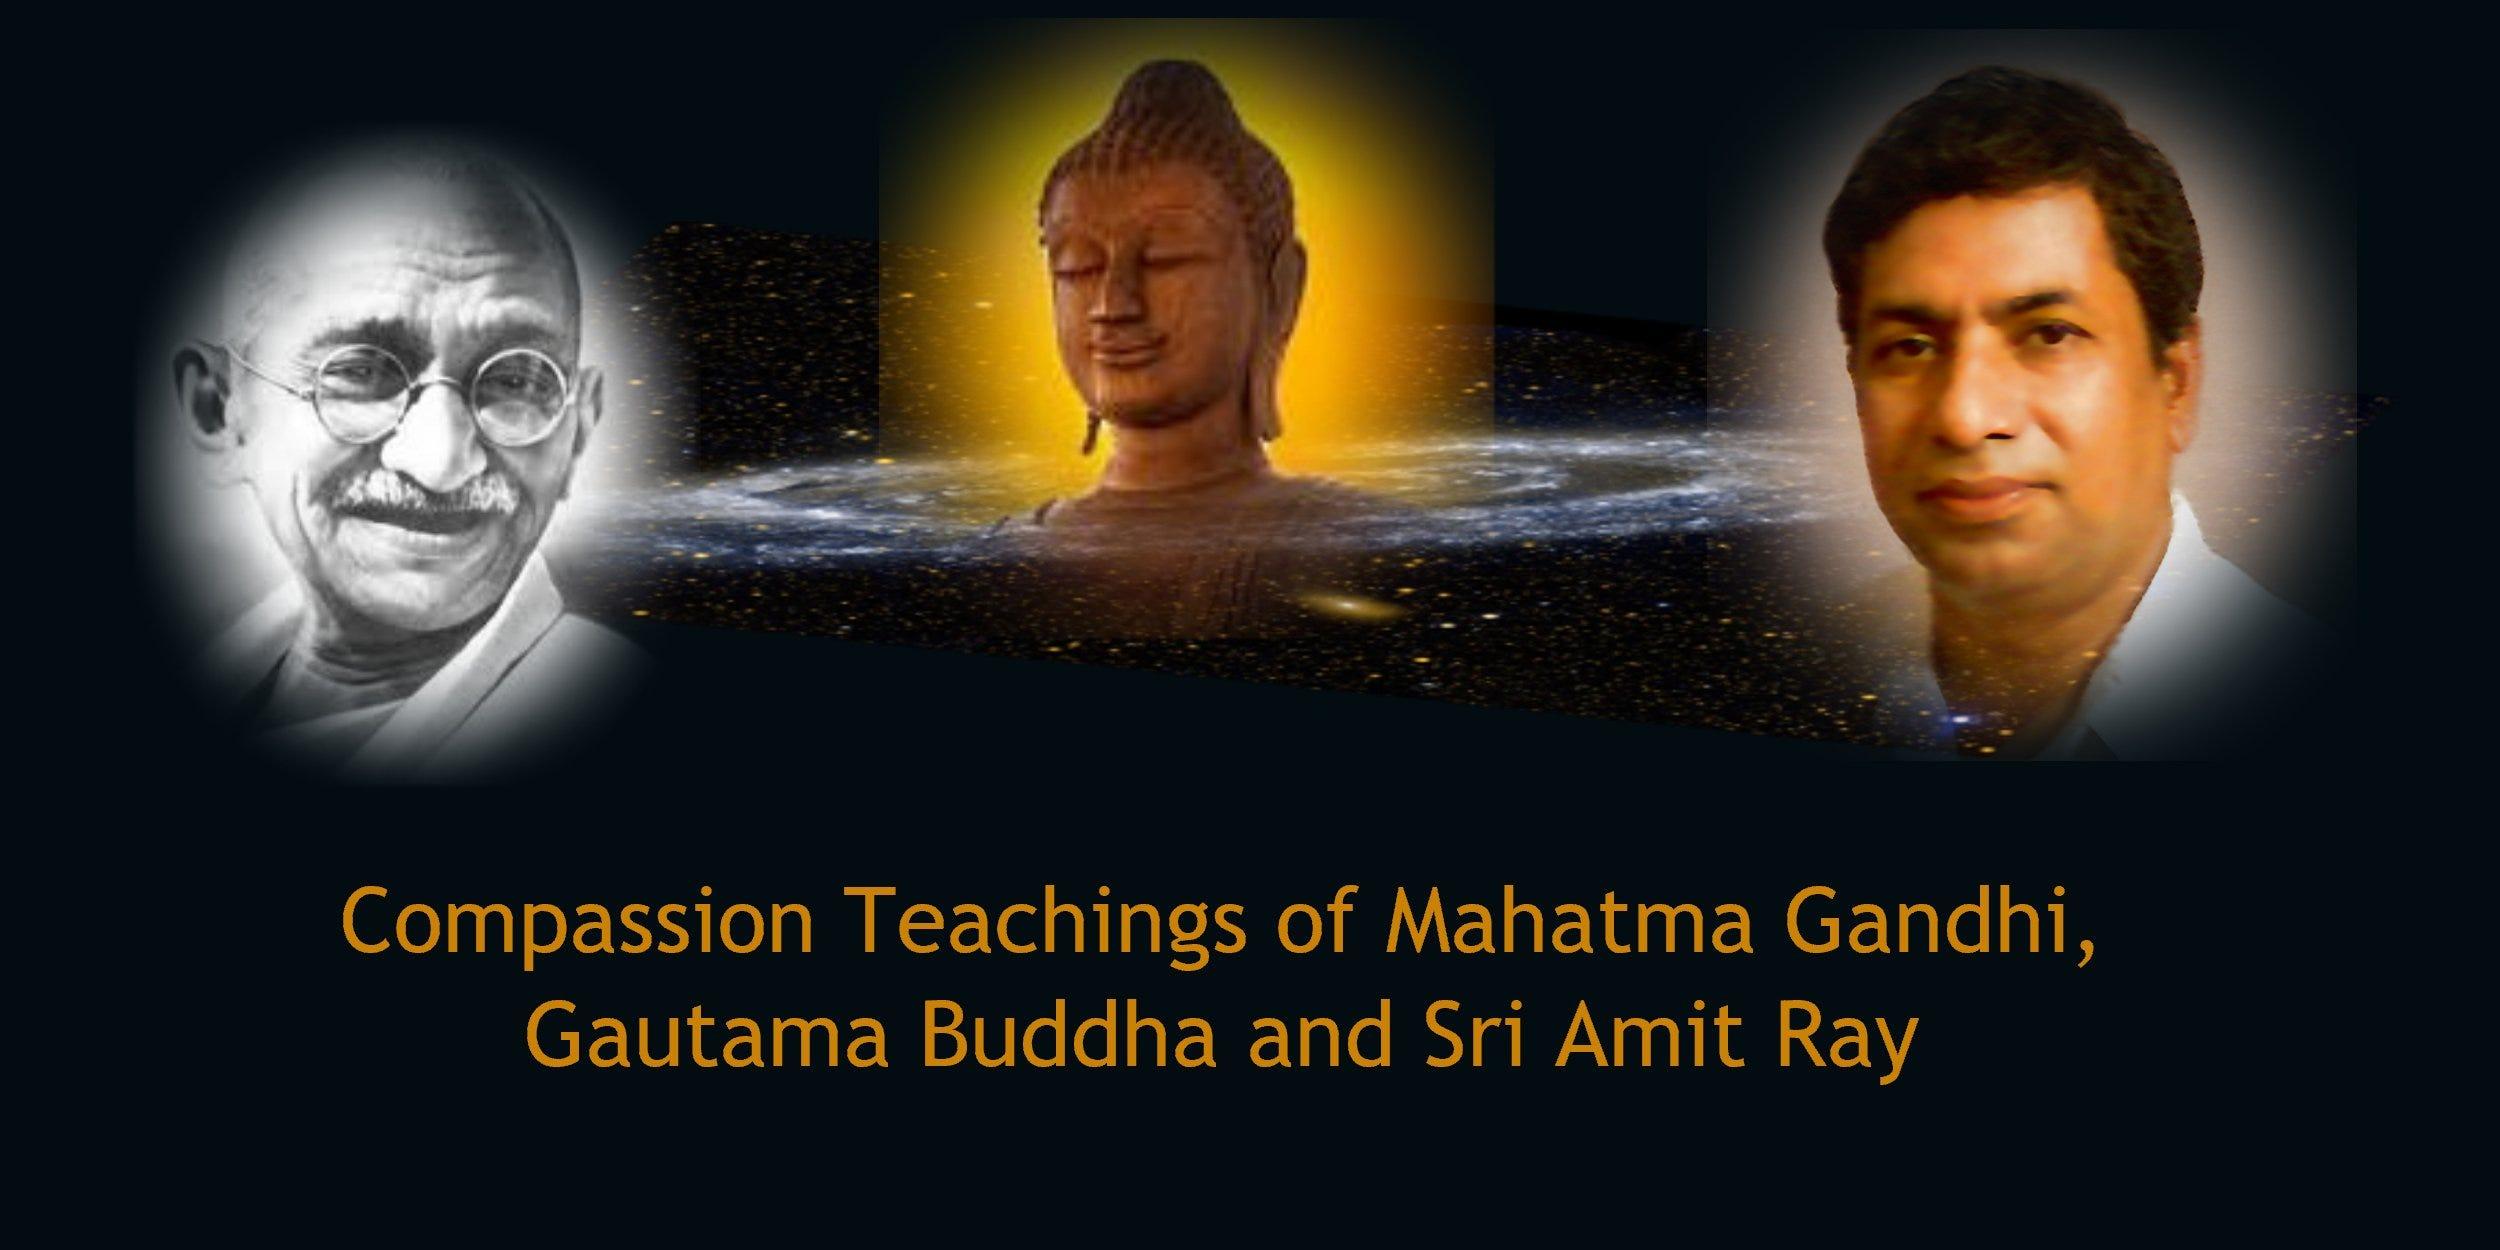 Compassion Teachings Of Mahatma Gandhi Gautama Buddha And Sri Amit Ray By Jeff Coleman Medium